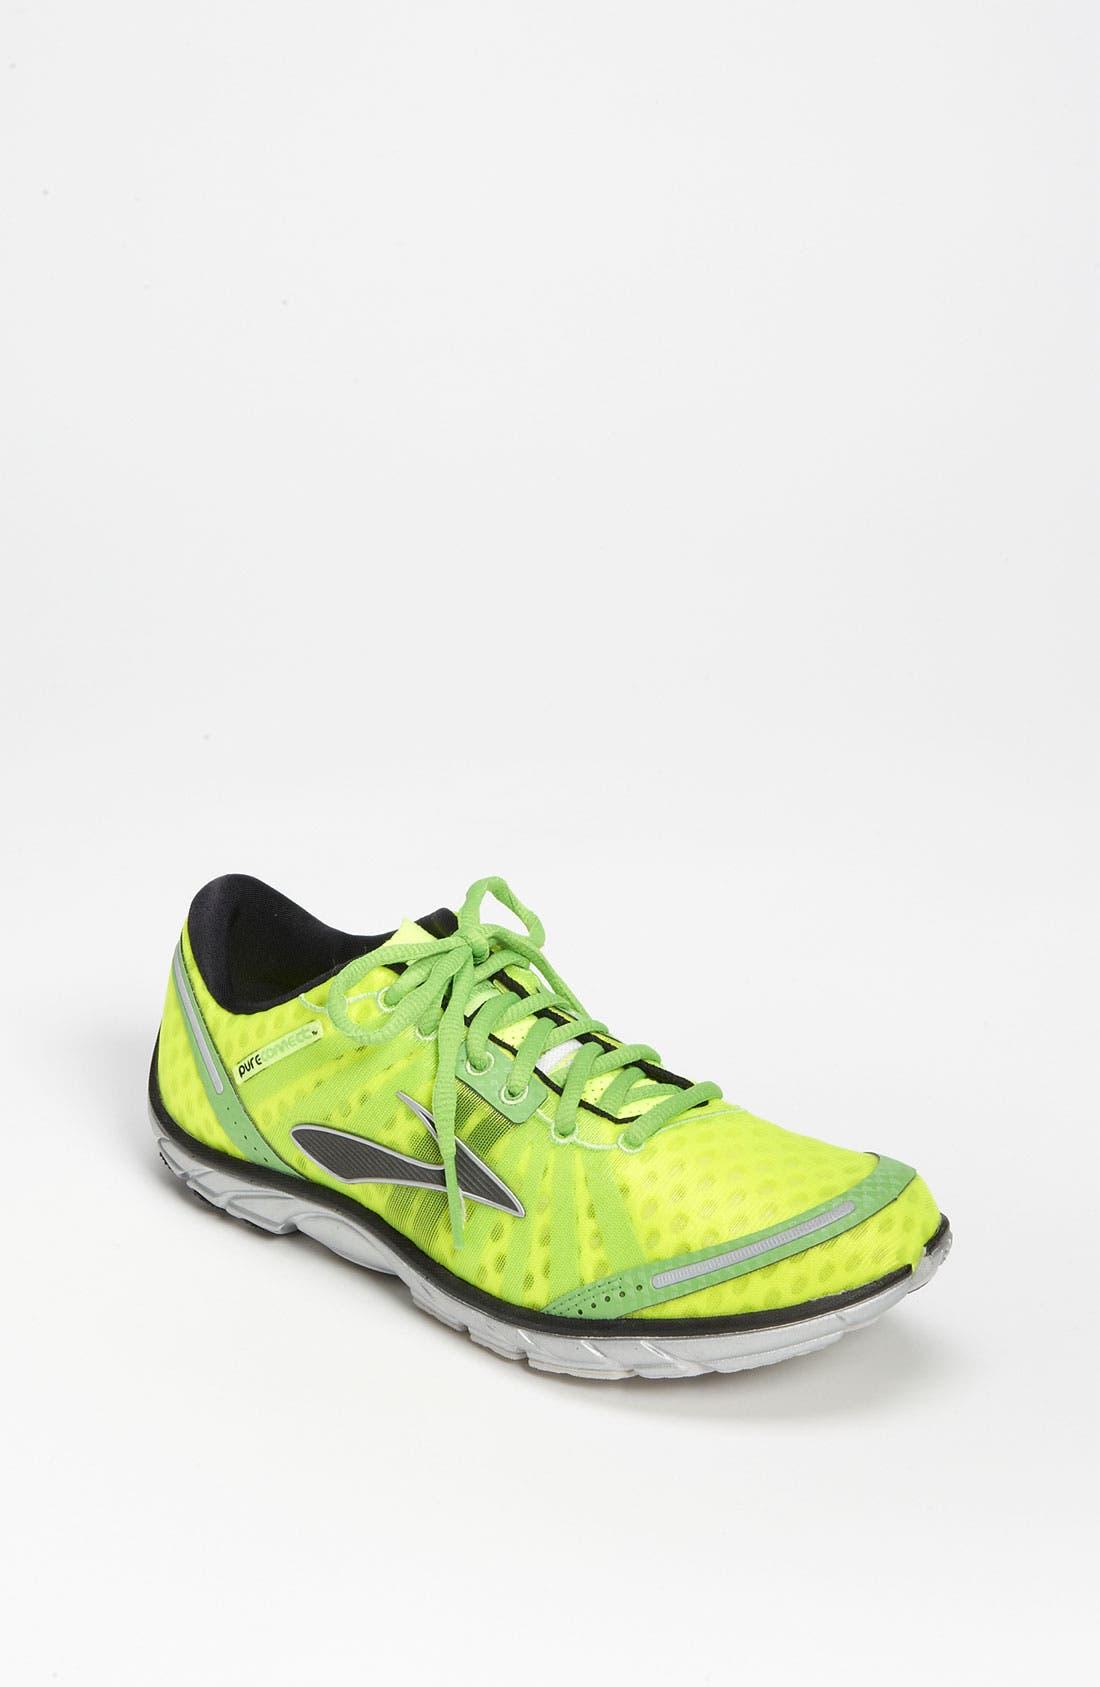 Main Image - Brooks 'PureConnect' Running Shoe (Women) (Regular Retail Price: $89.95)